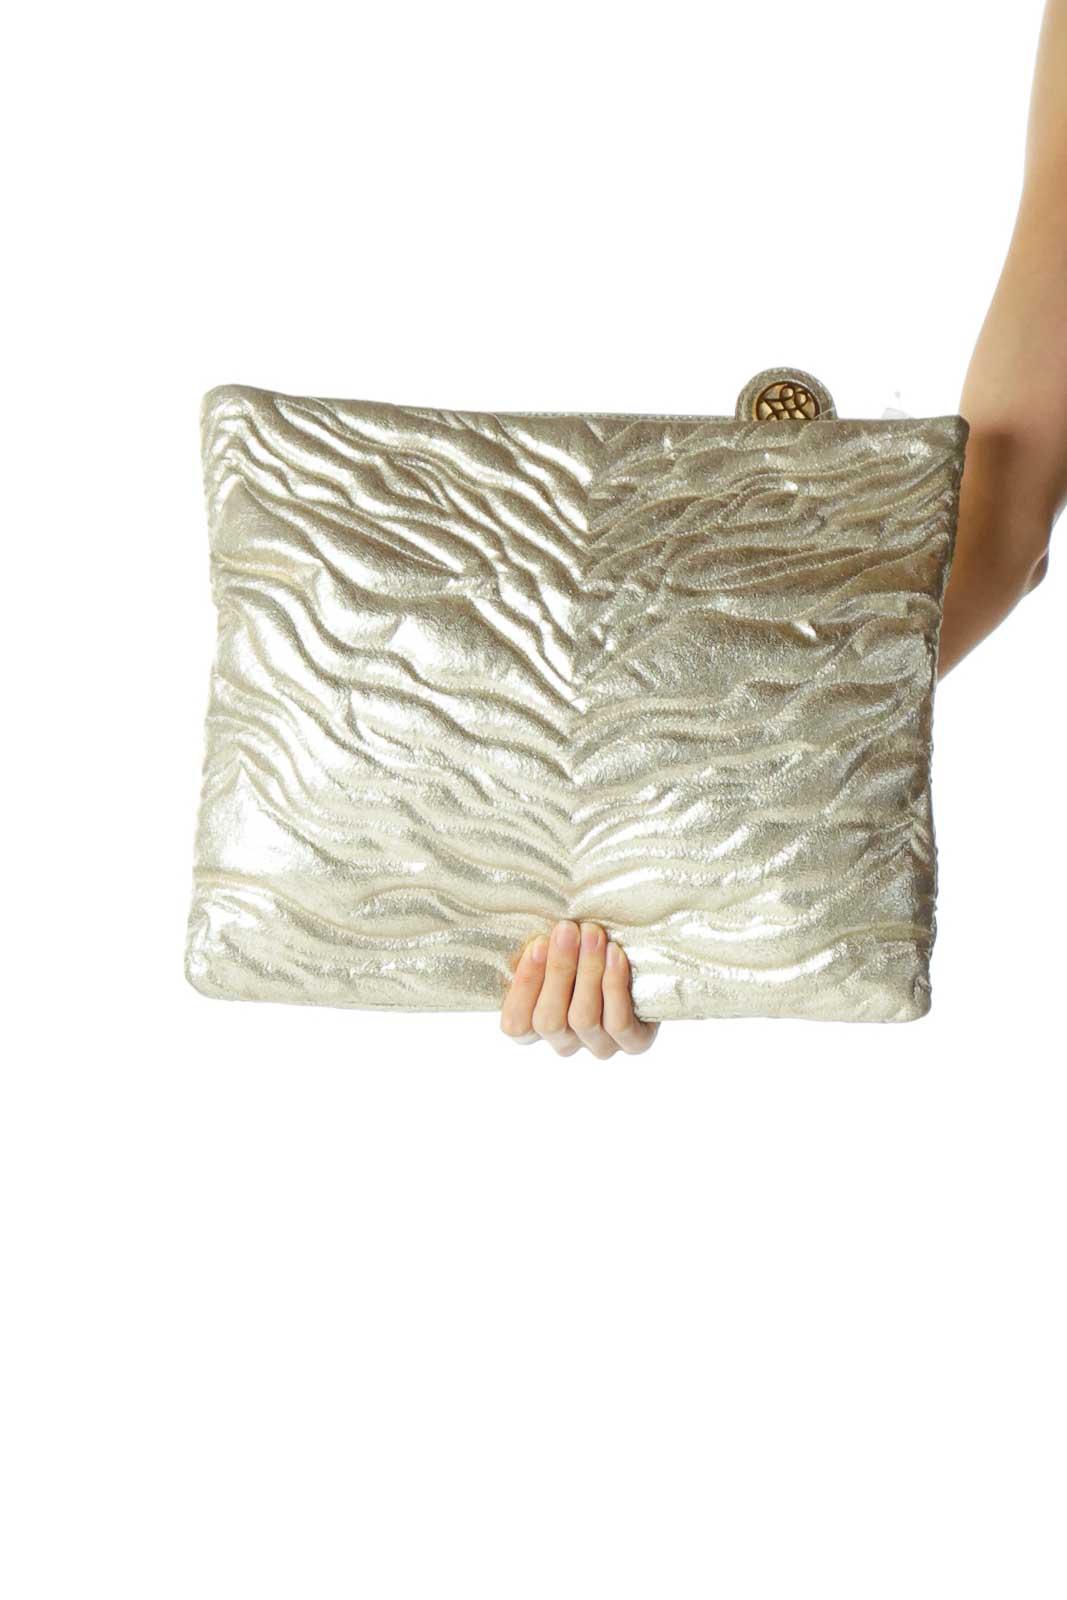 Gold Metallic Textured Clutch Front